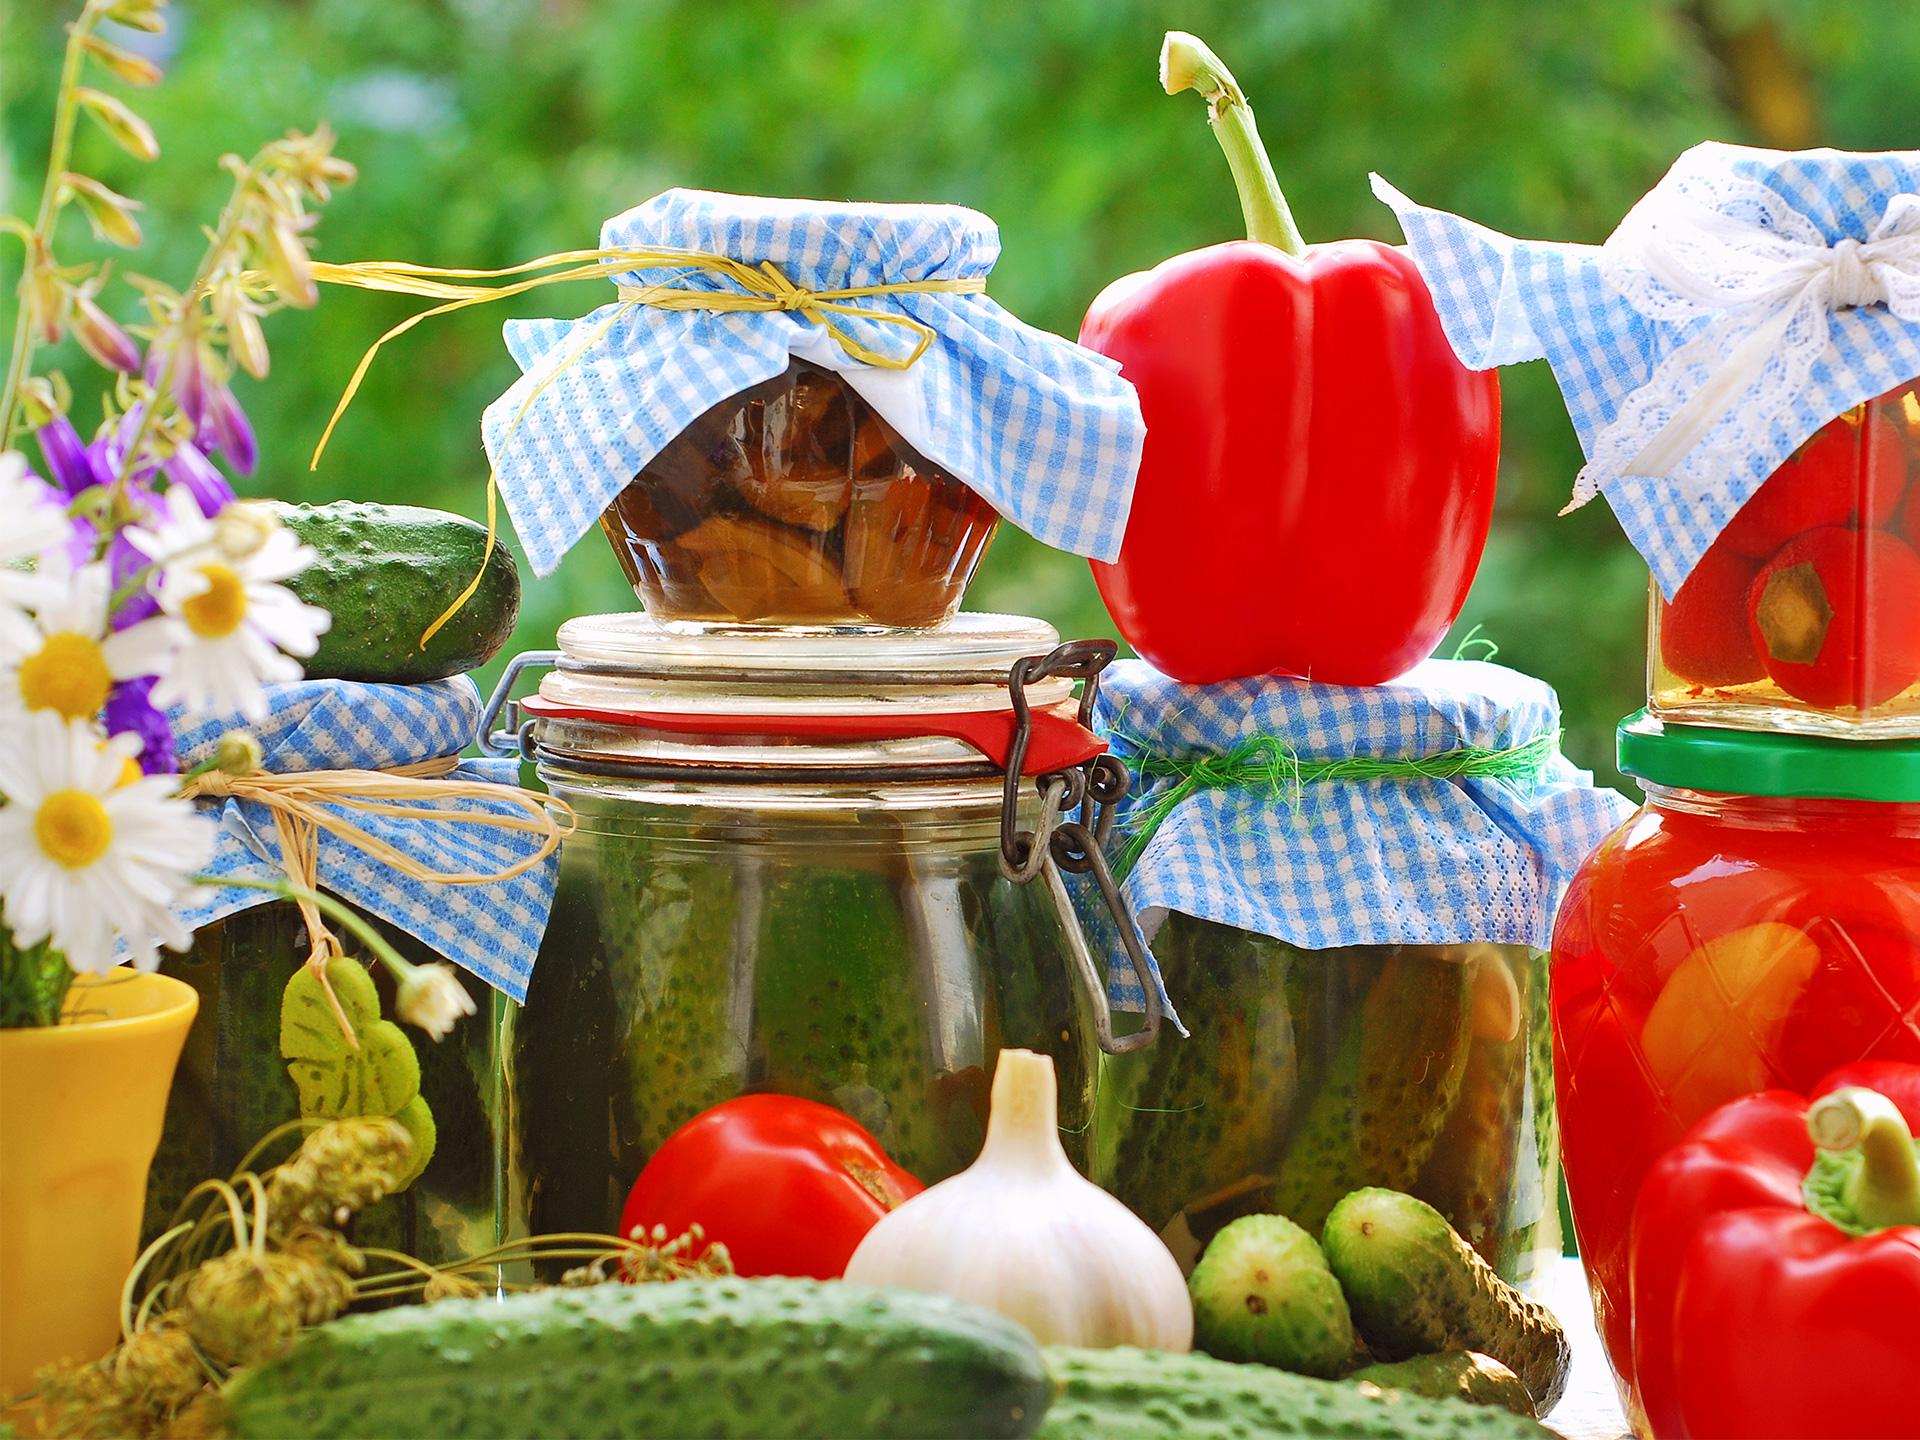 Herbs Natura - Herbal Remedies